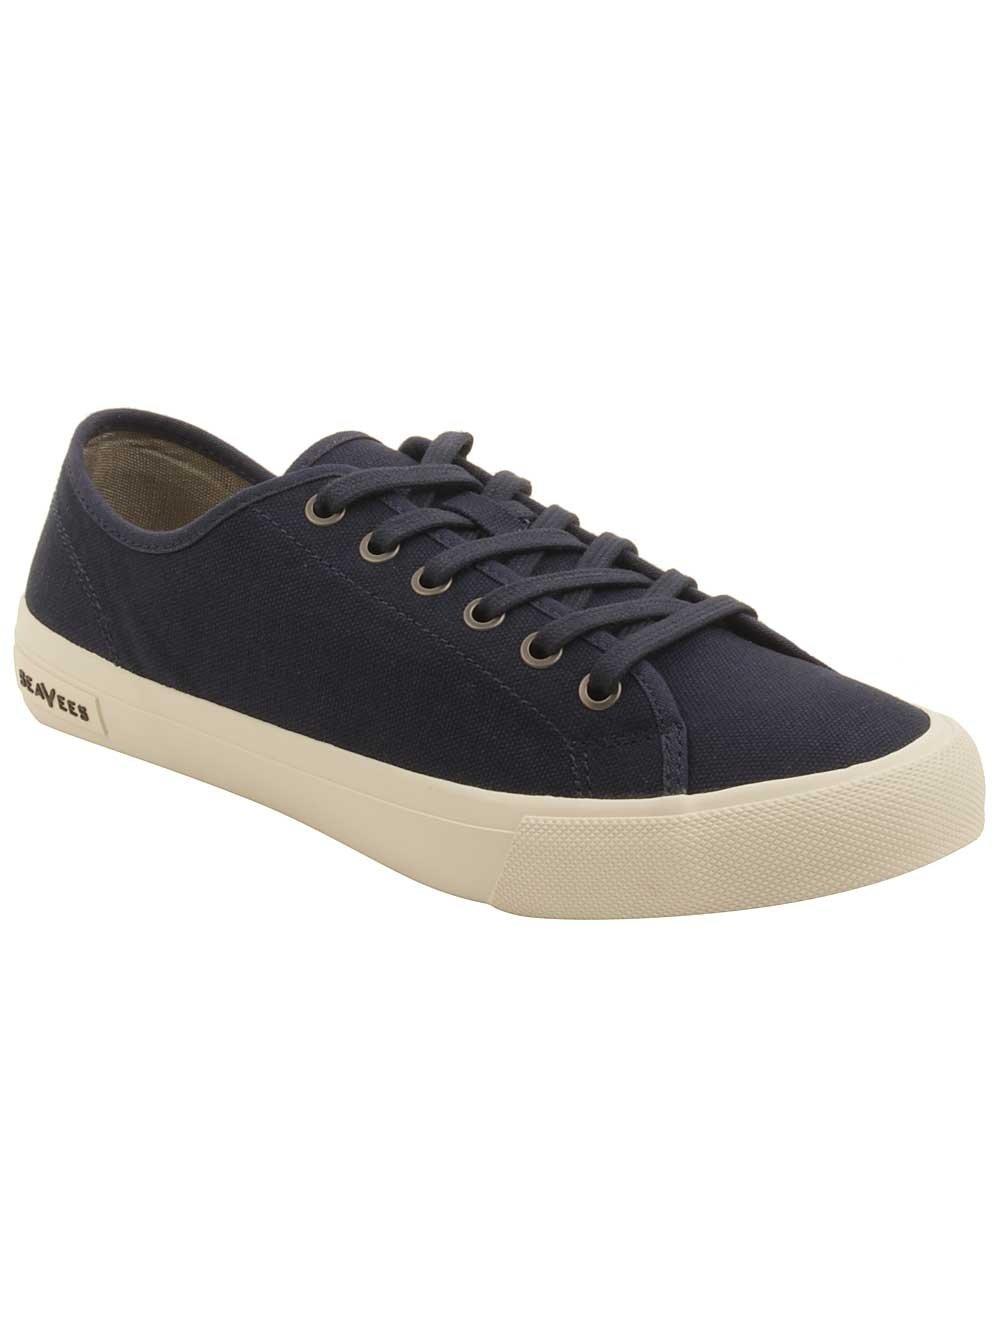 SeaVees Men's Monterey Standard M Sneaker B07889WJVQ 12 M Standard US Navy cb23cc